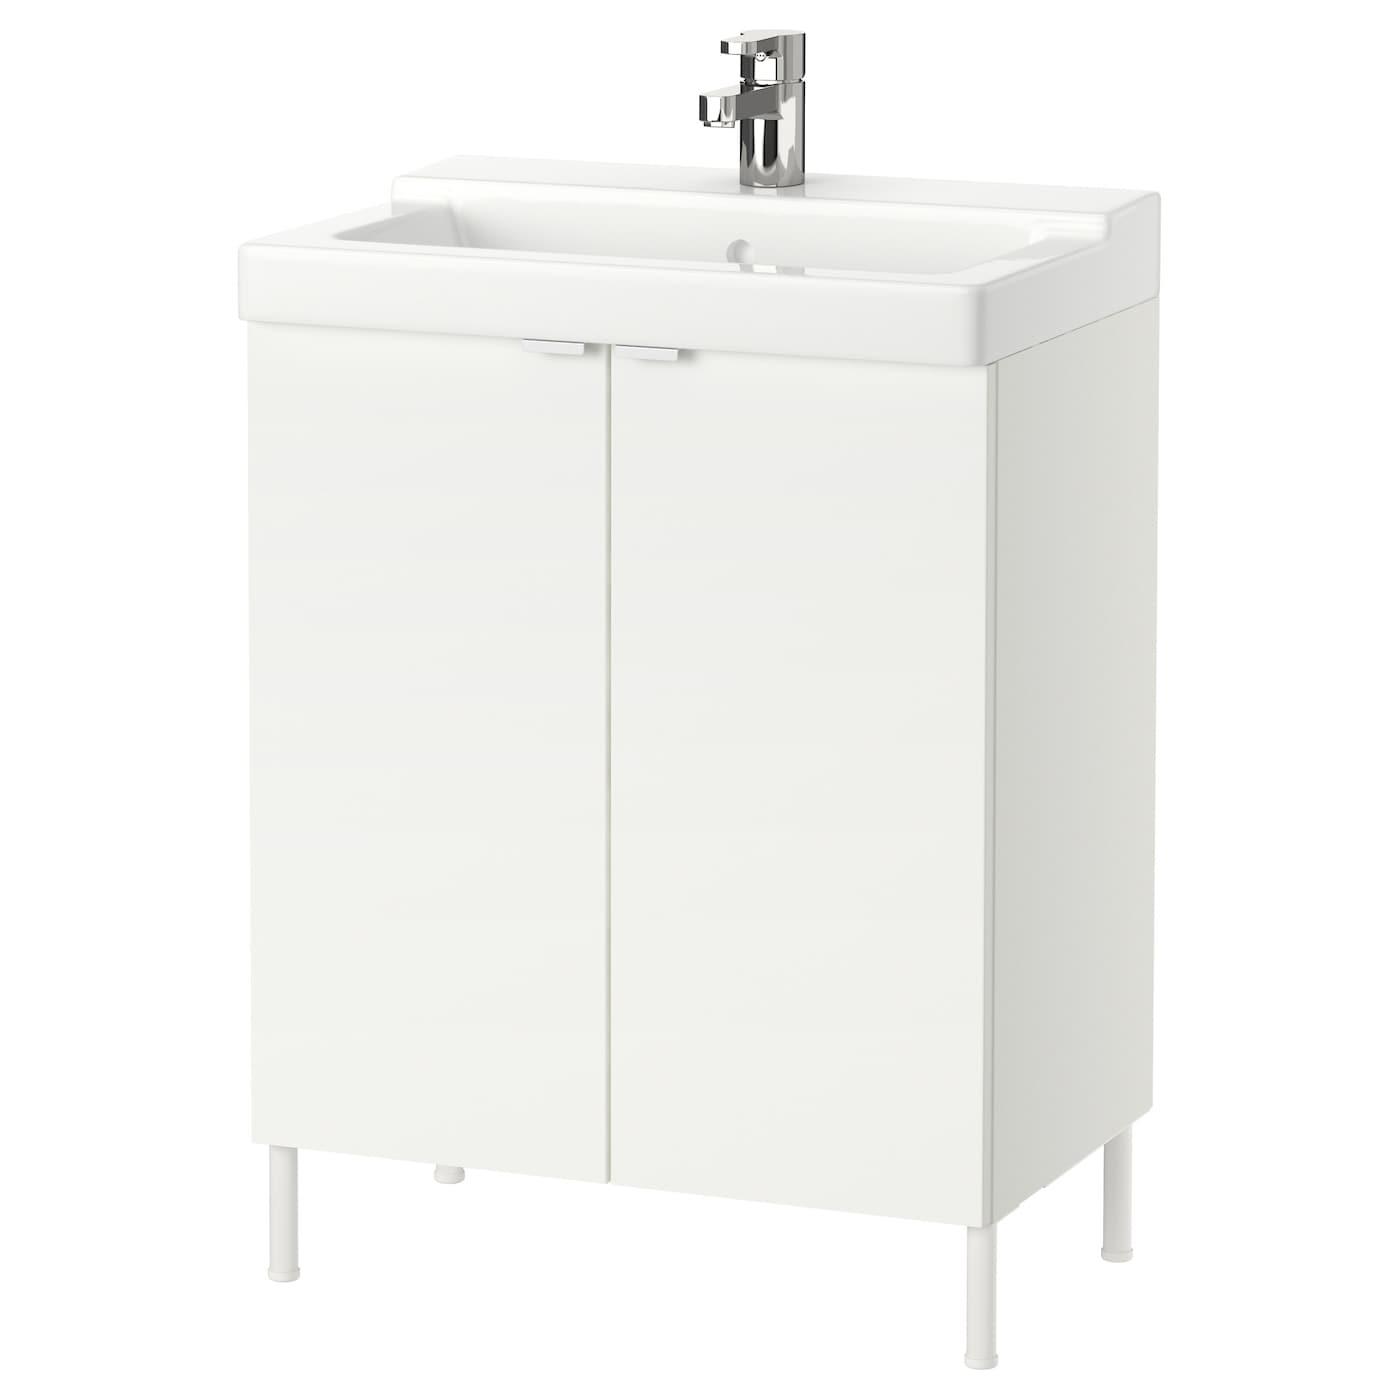 IKEA LILLANGEN TALLEVIKEN Washbasin Cabinet With 2 Doors